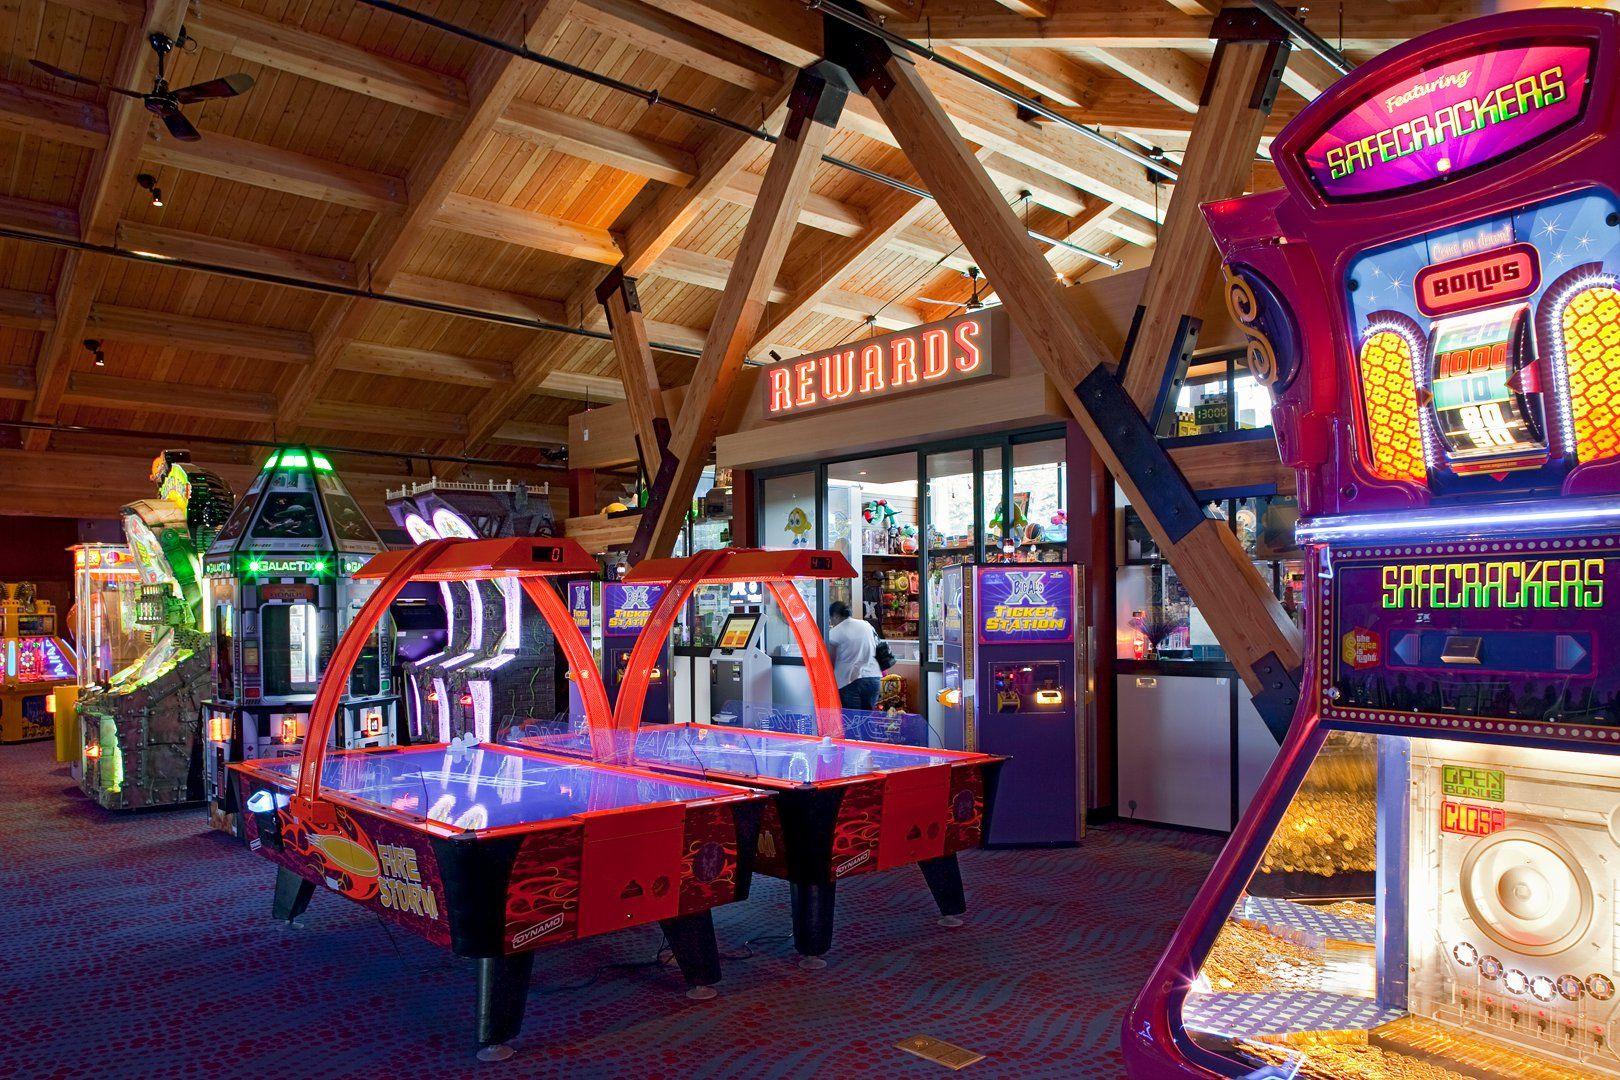 Arcade Arcade Stranger Things Funko Pop Arcade Machine